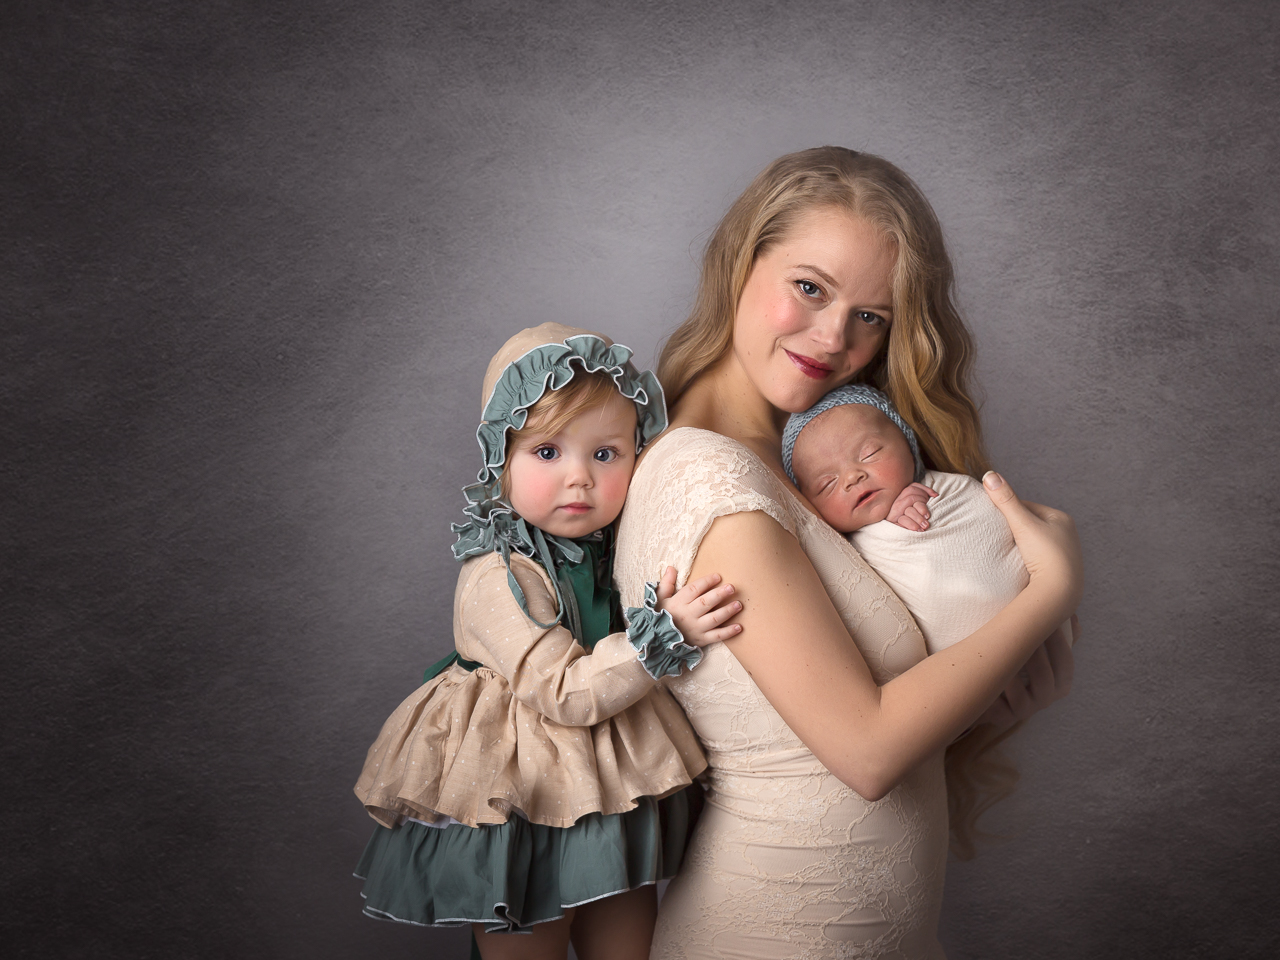 nyc family photoshoot newborn mom and kids vintage brooklyn heights-1289.jpg